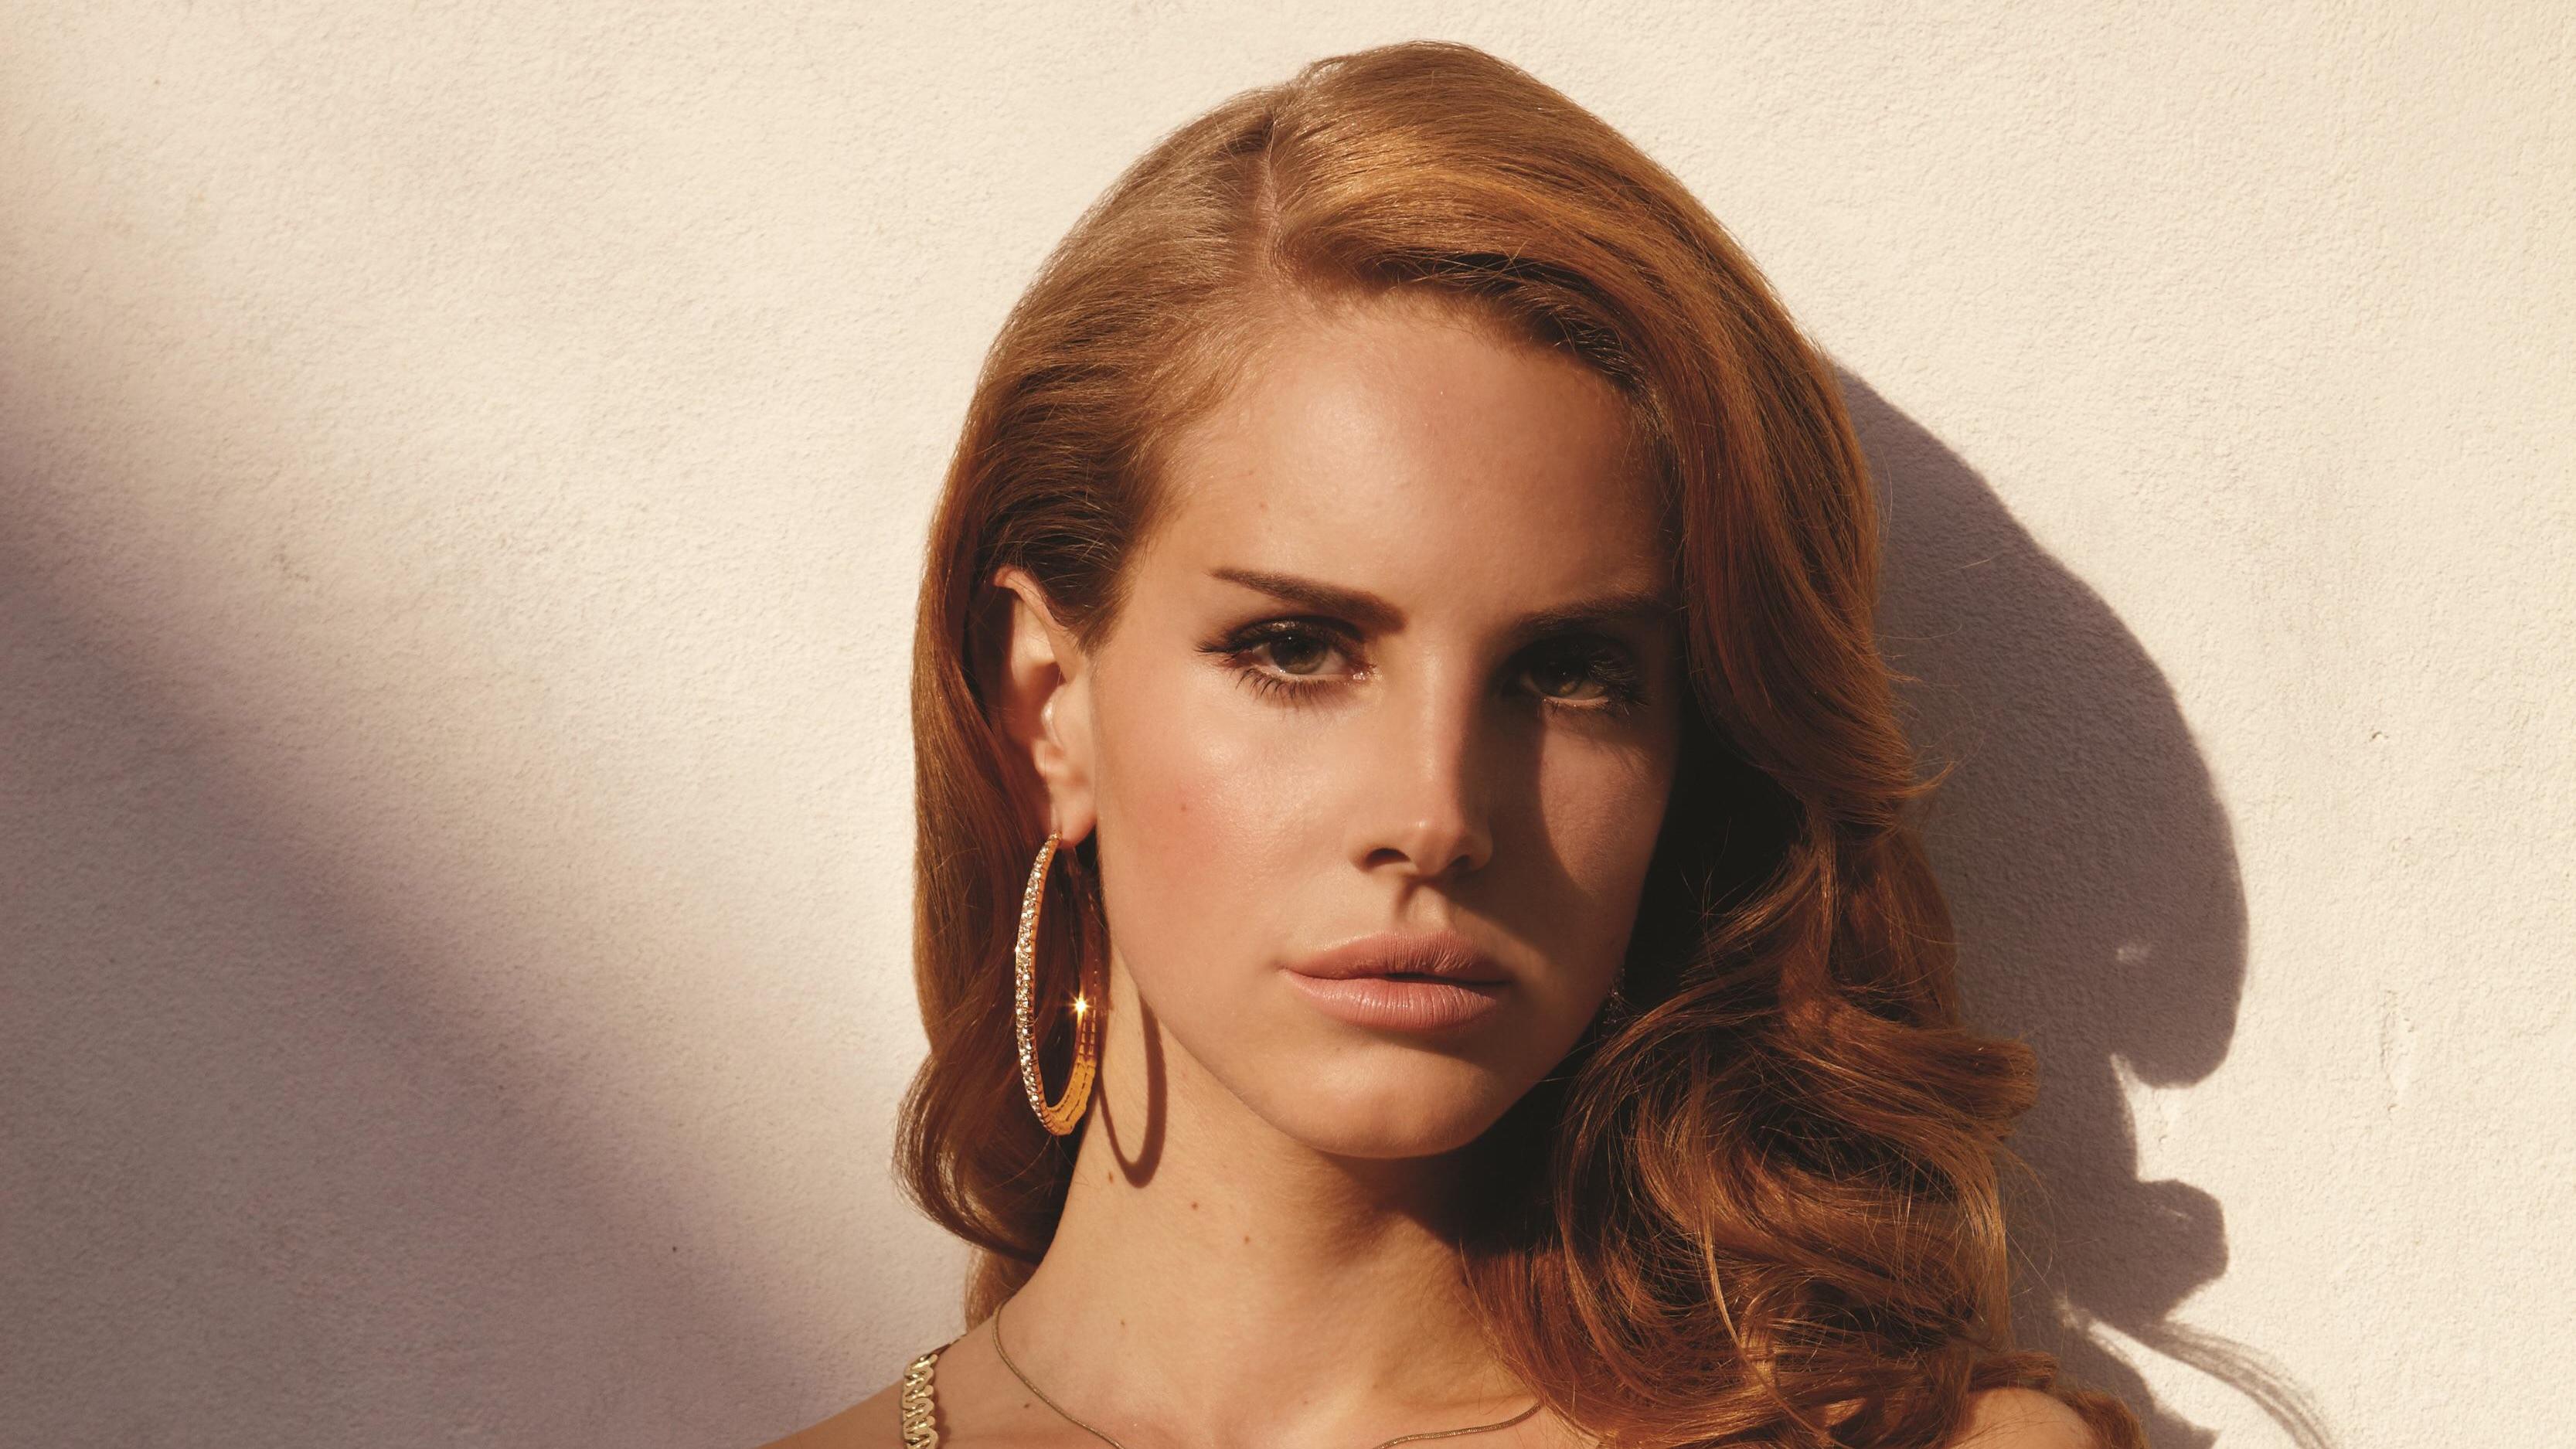 Lana Del Rey 2019 4k, HD Music, 4k Wallpapers, Images ...